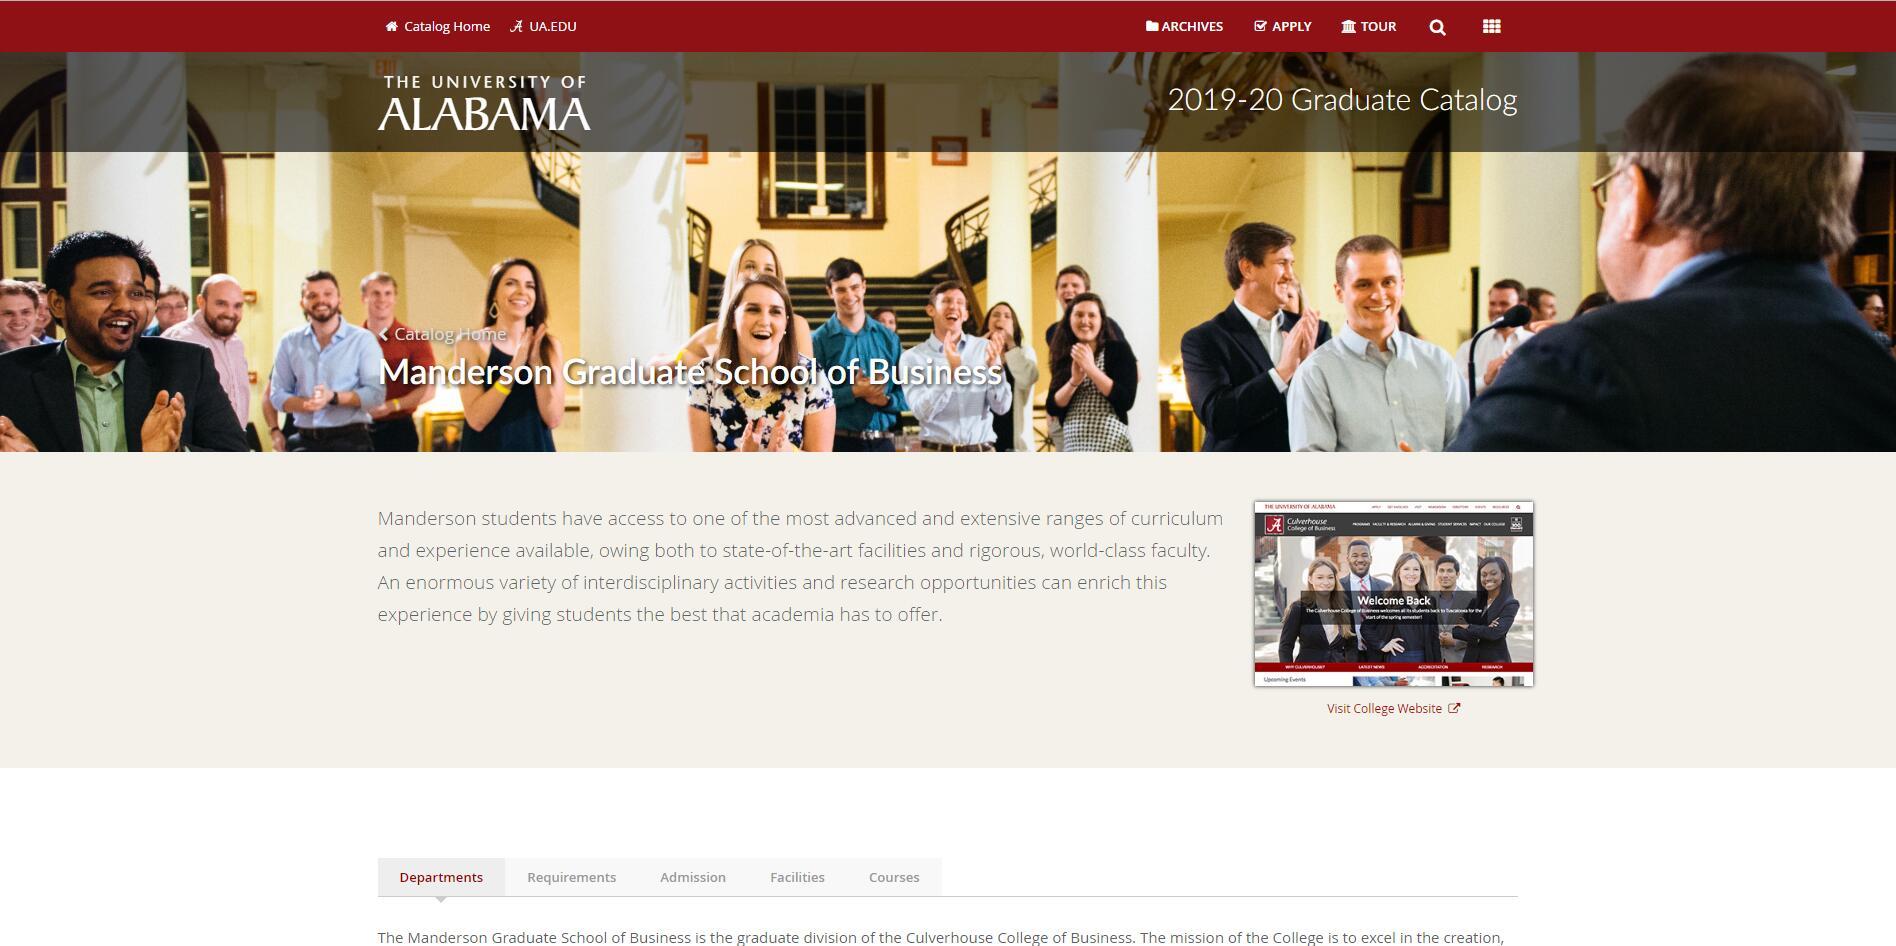 The Manderson Graduate School of Business at University of Alabama